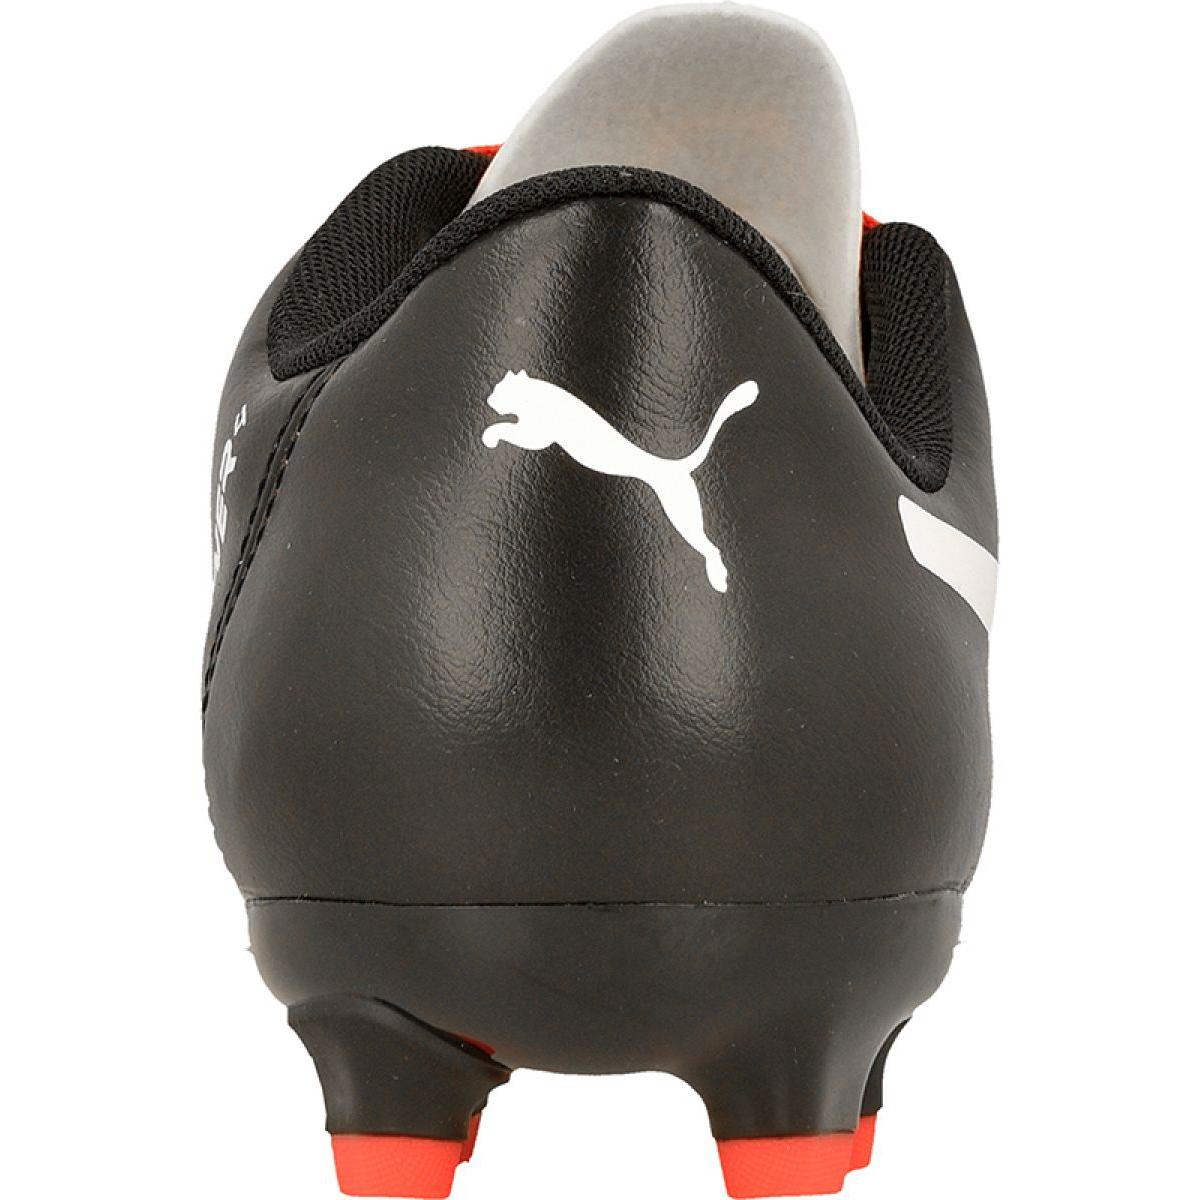 Chaussures-de-football-Puma-evoPOWER-4-3-Fg-M-10358503 miniature 3